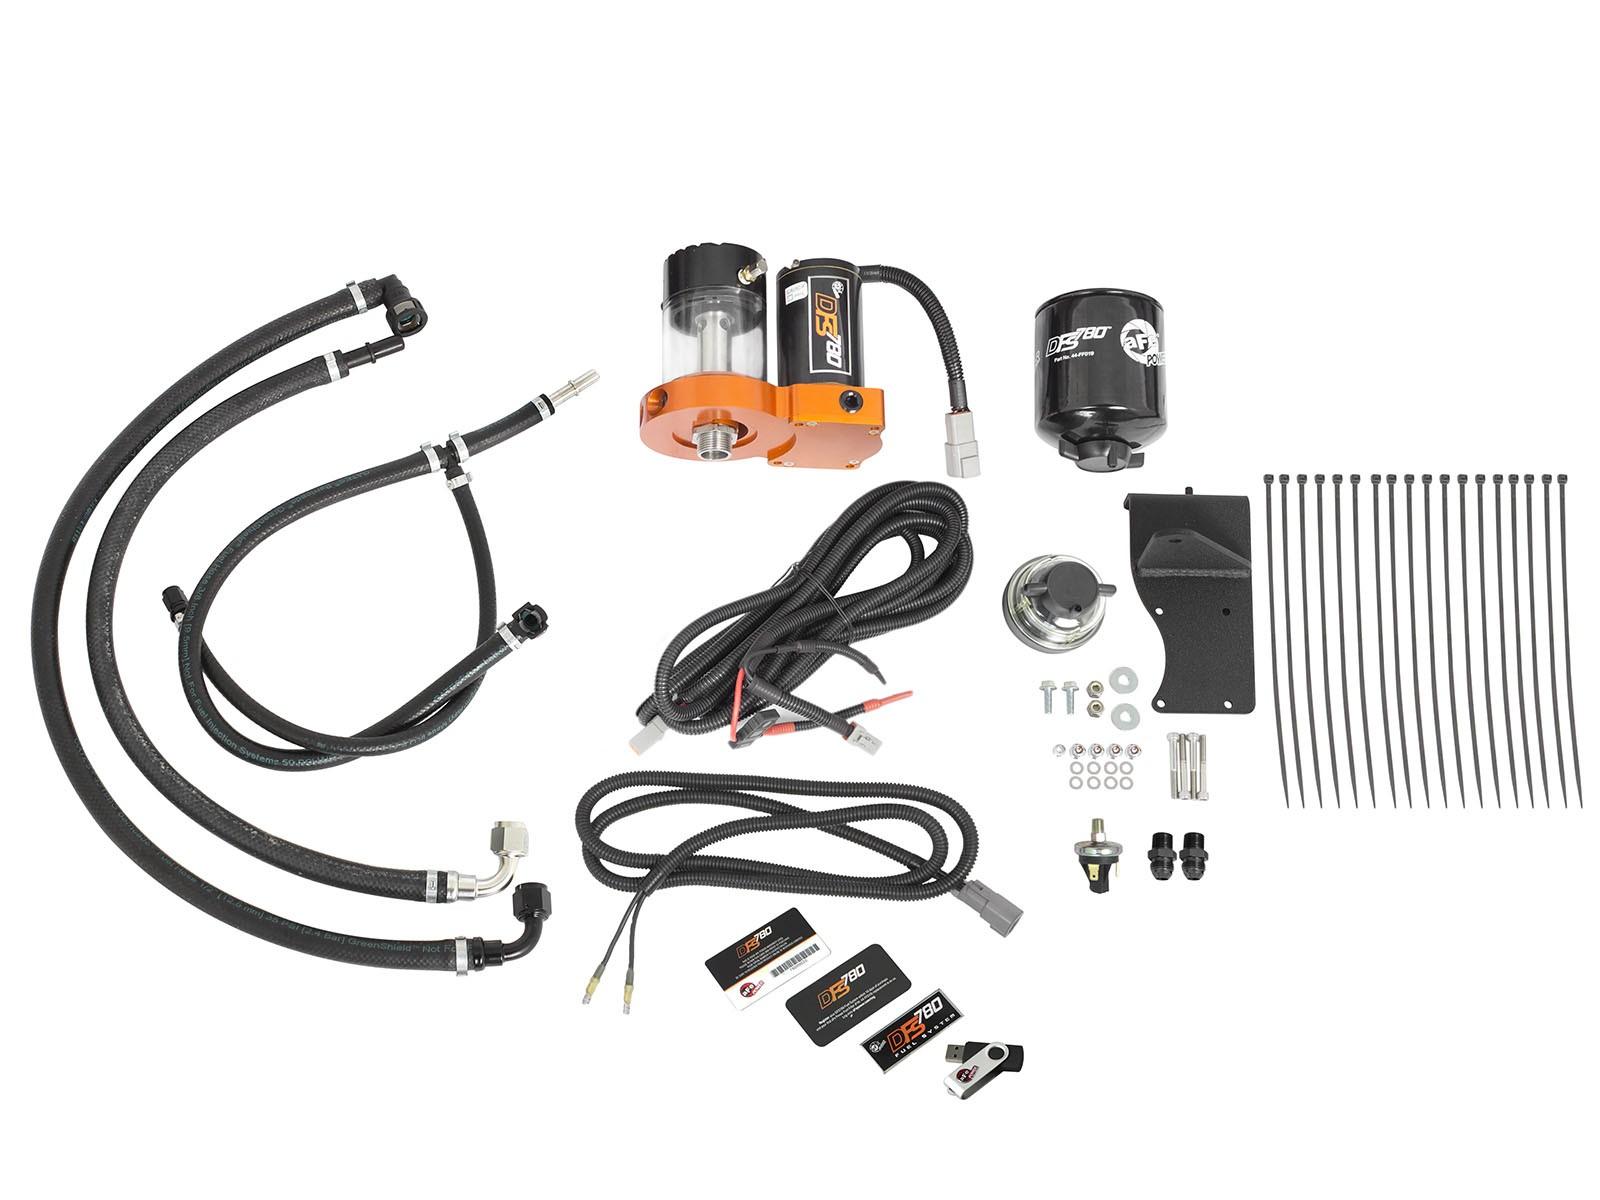 Dfs780 Fuel System